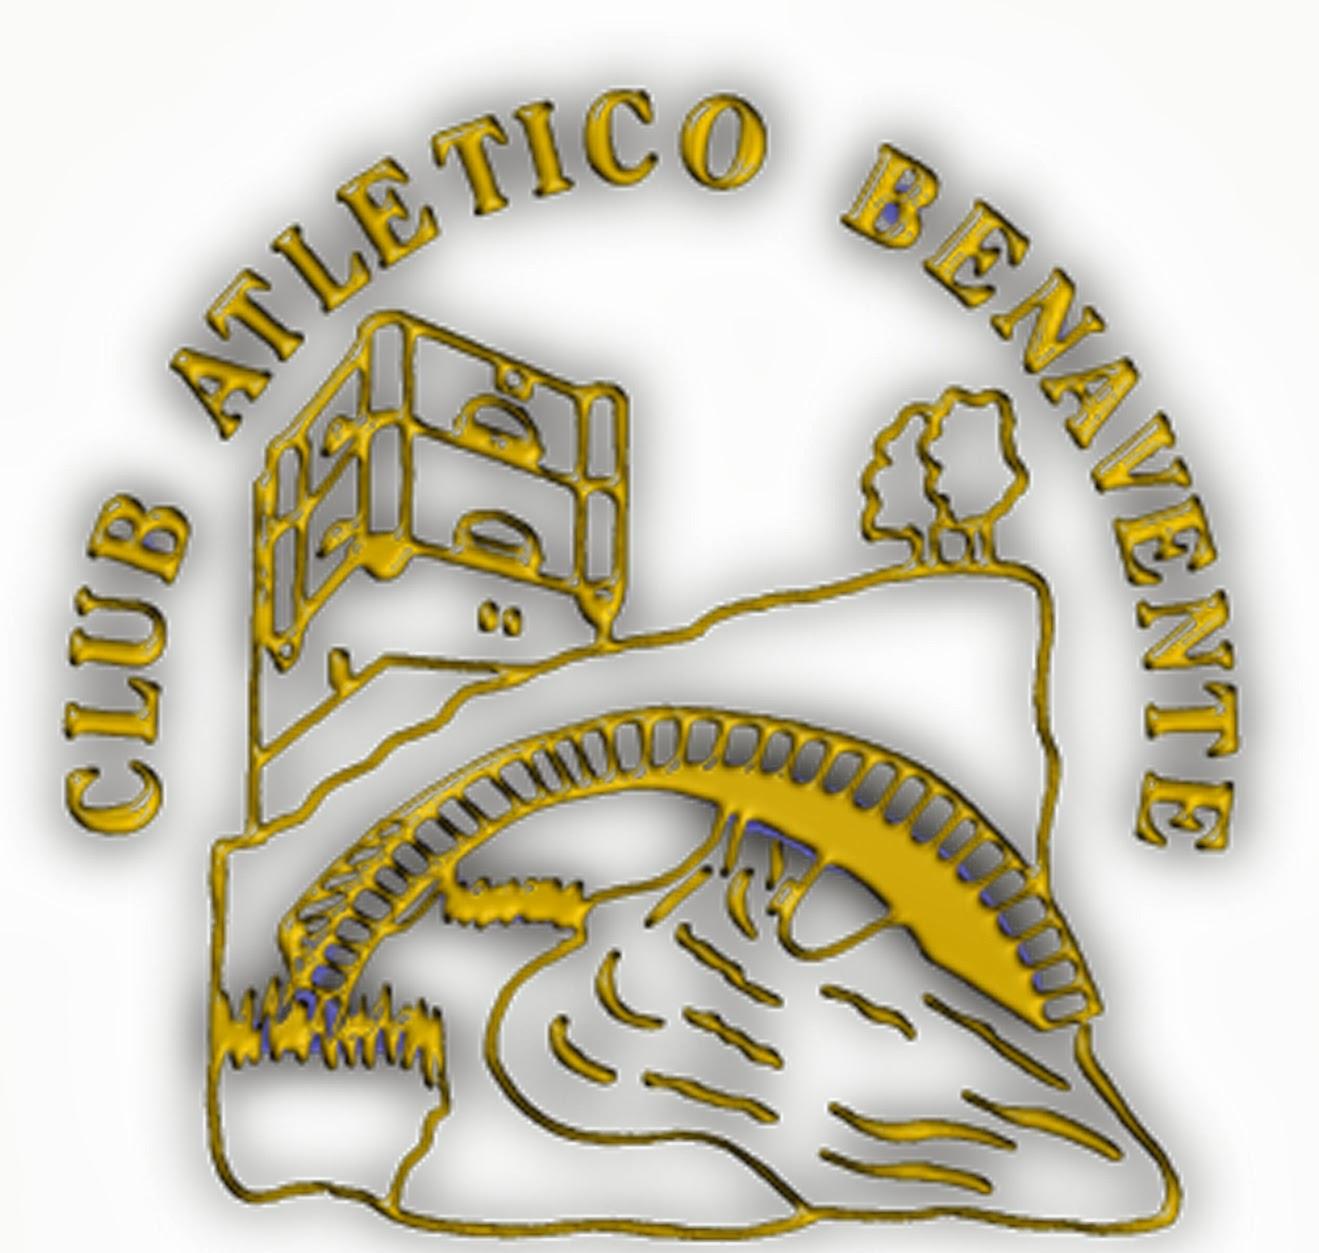 ATLÉTICO BENAVENTE F.S.